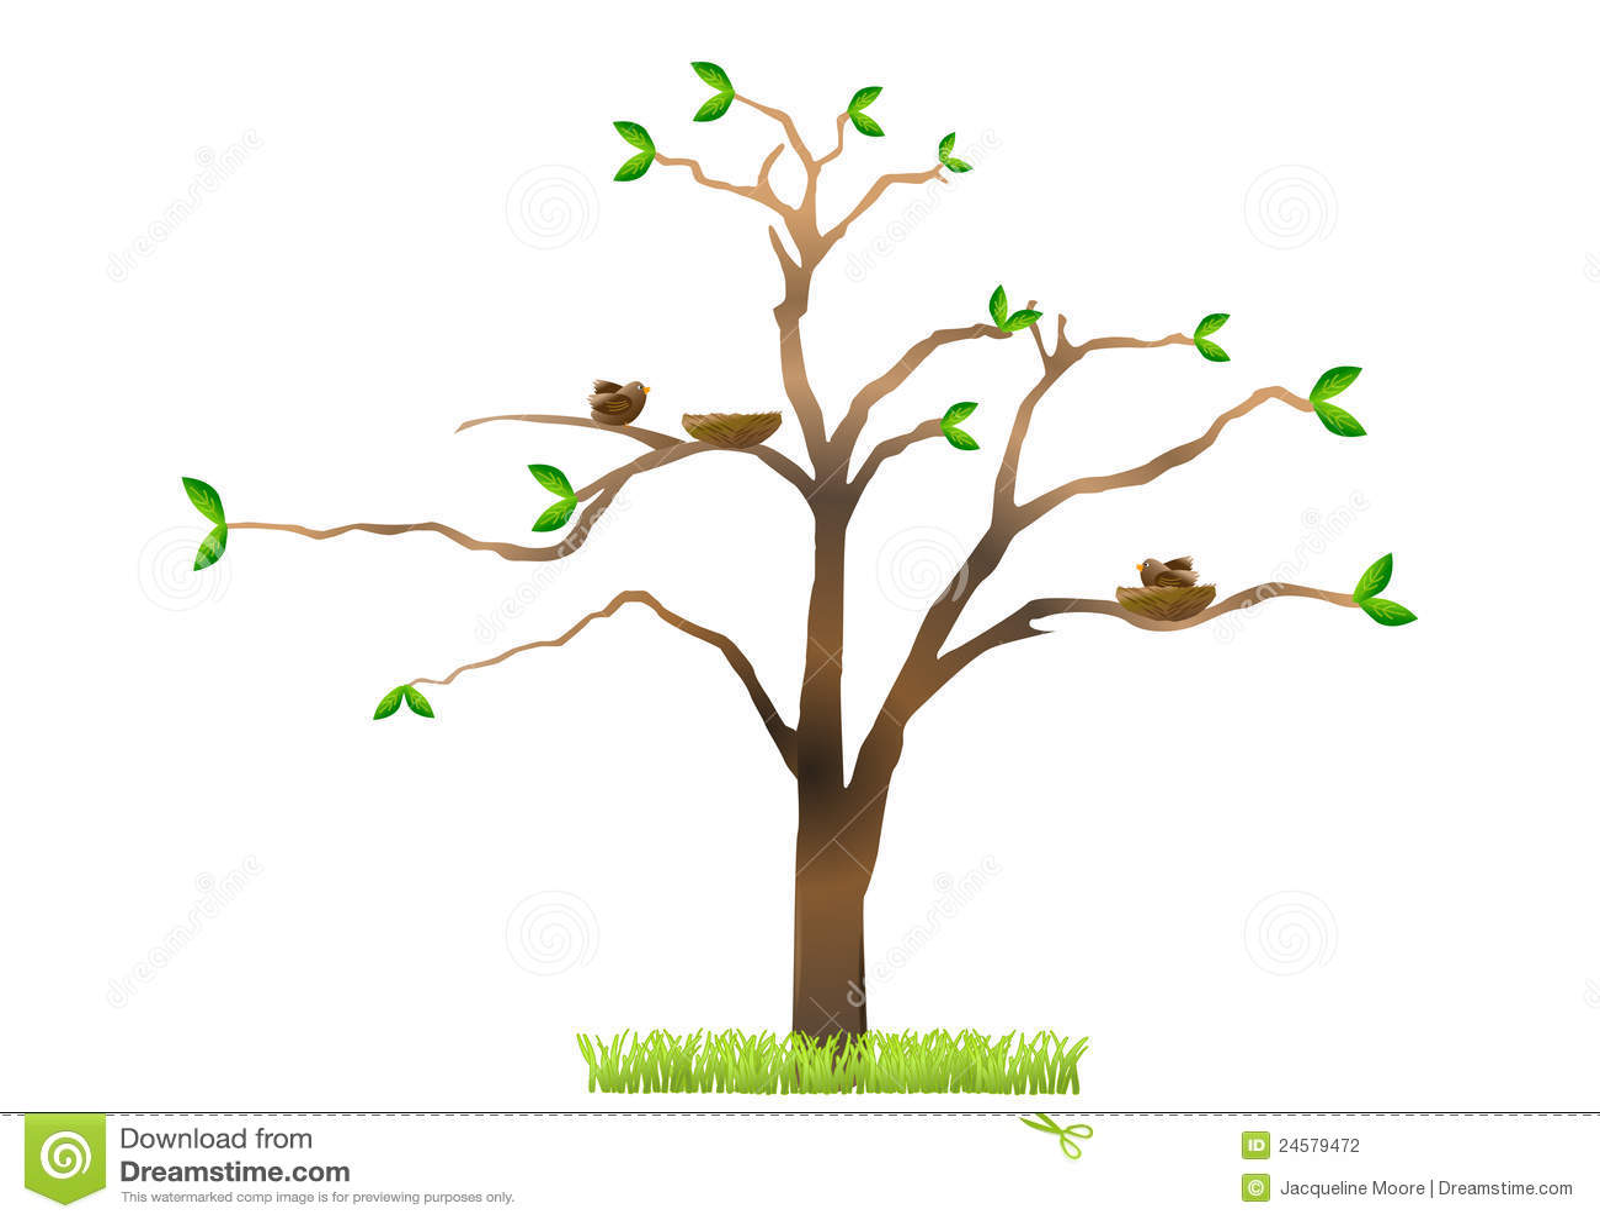 Tree with birds nesting stock illustration. Illustration ...